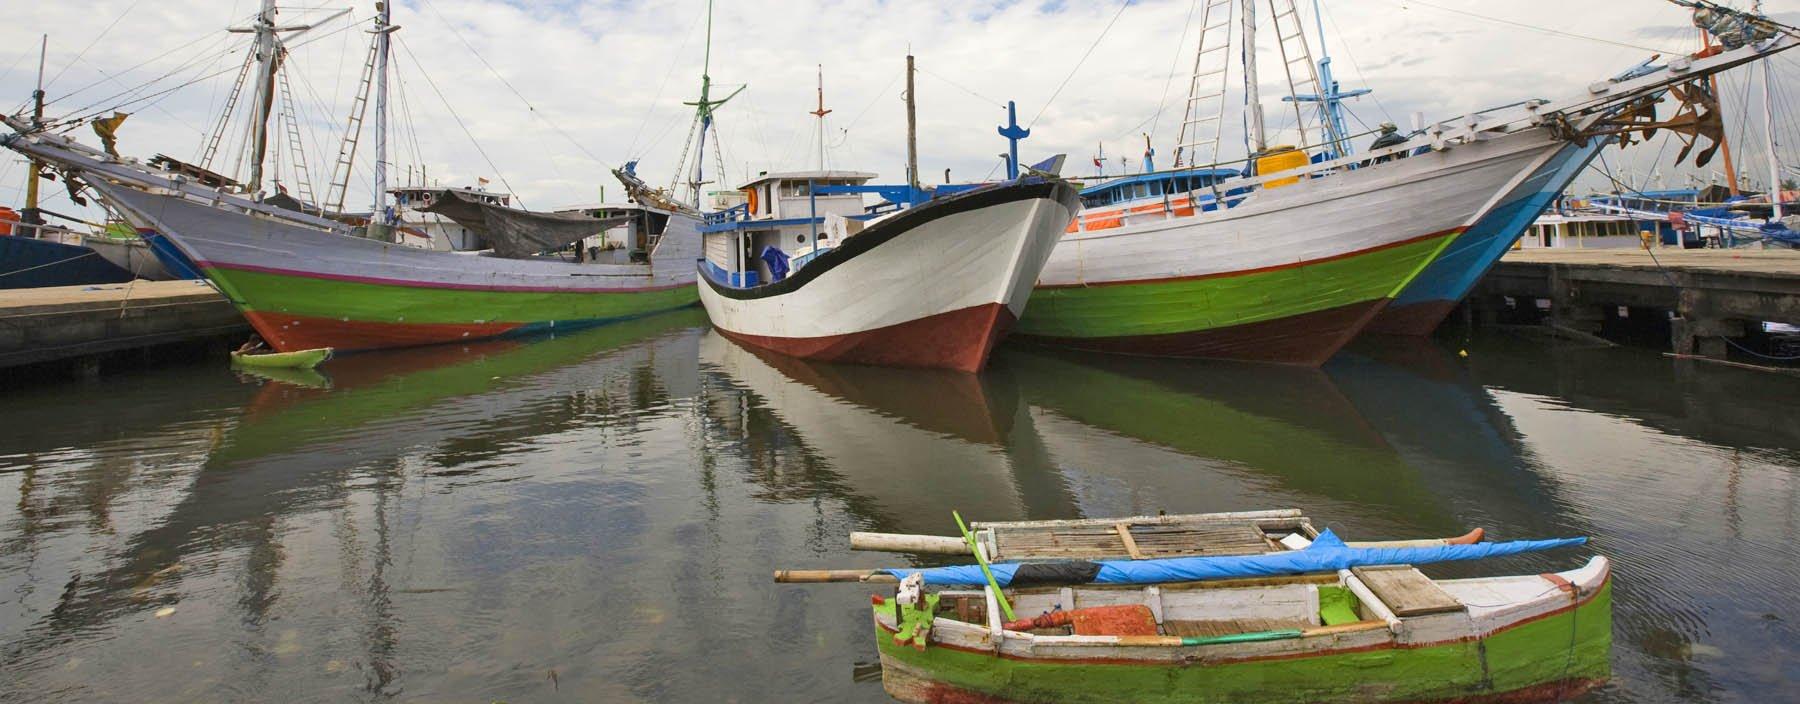 id, sulawesi, makassar, paotere harbor (1).jpg